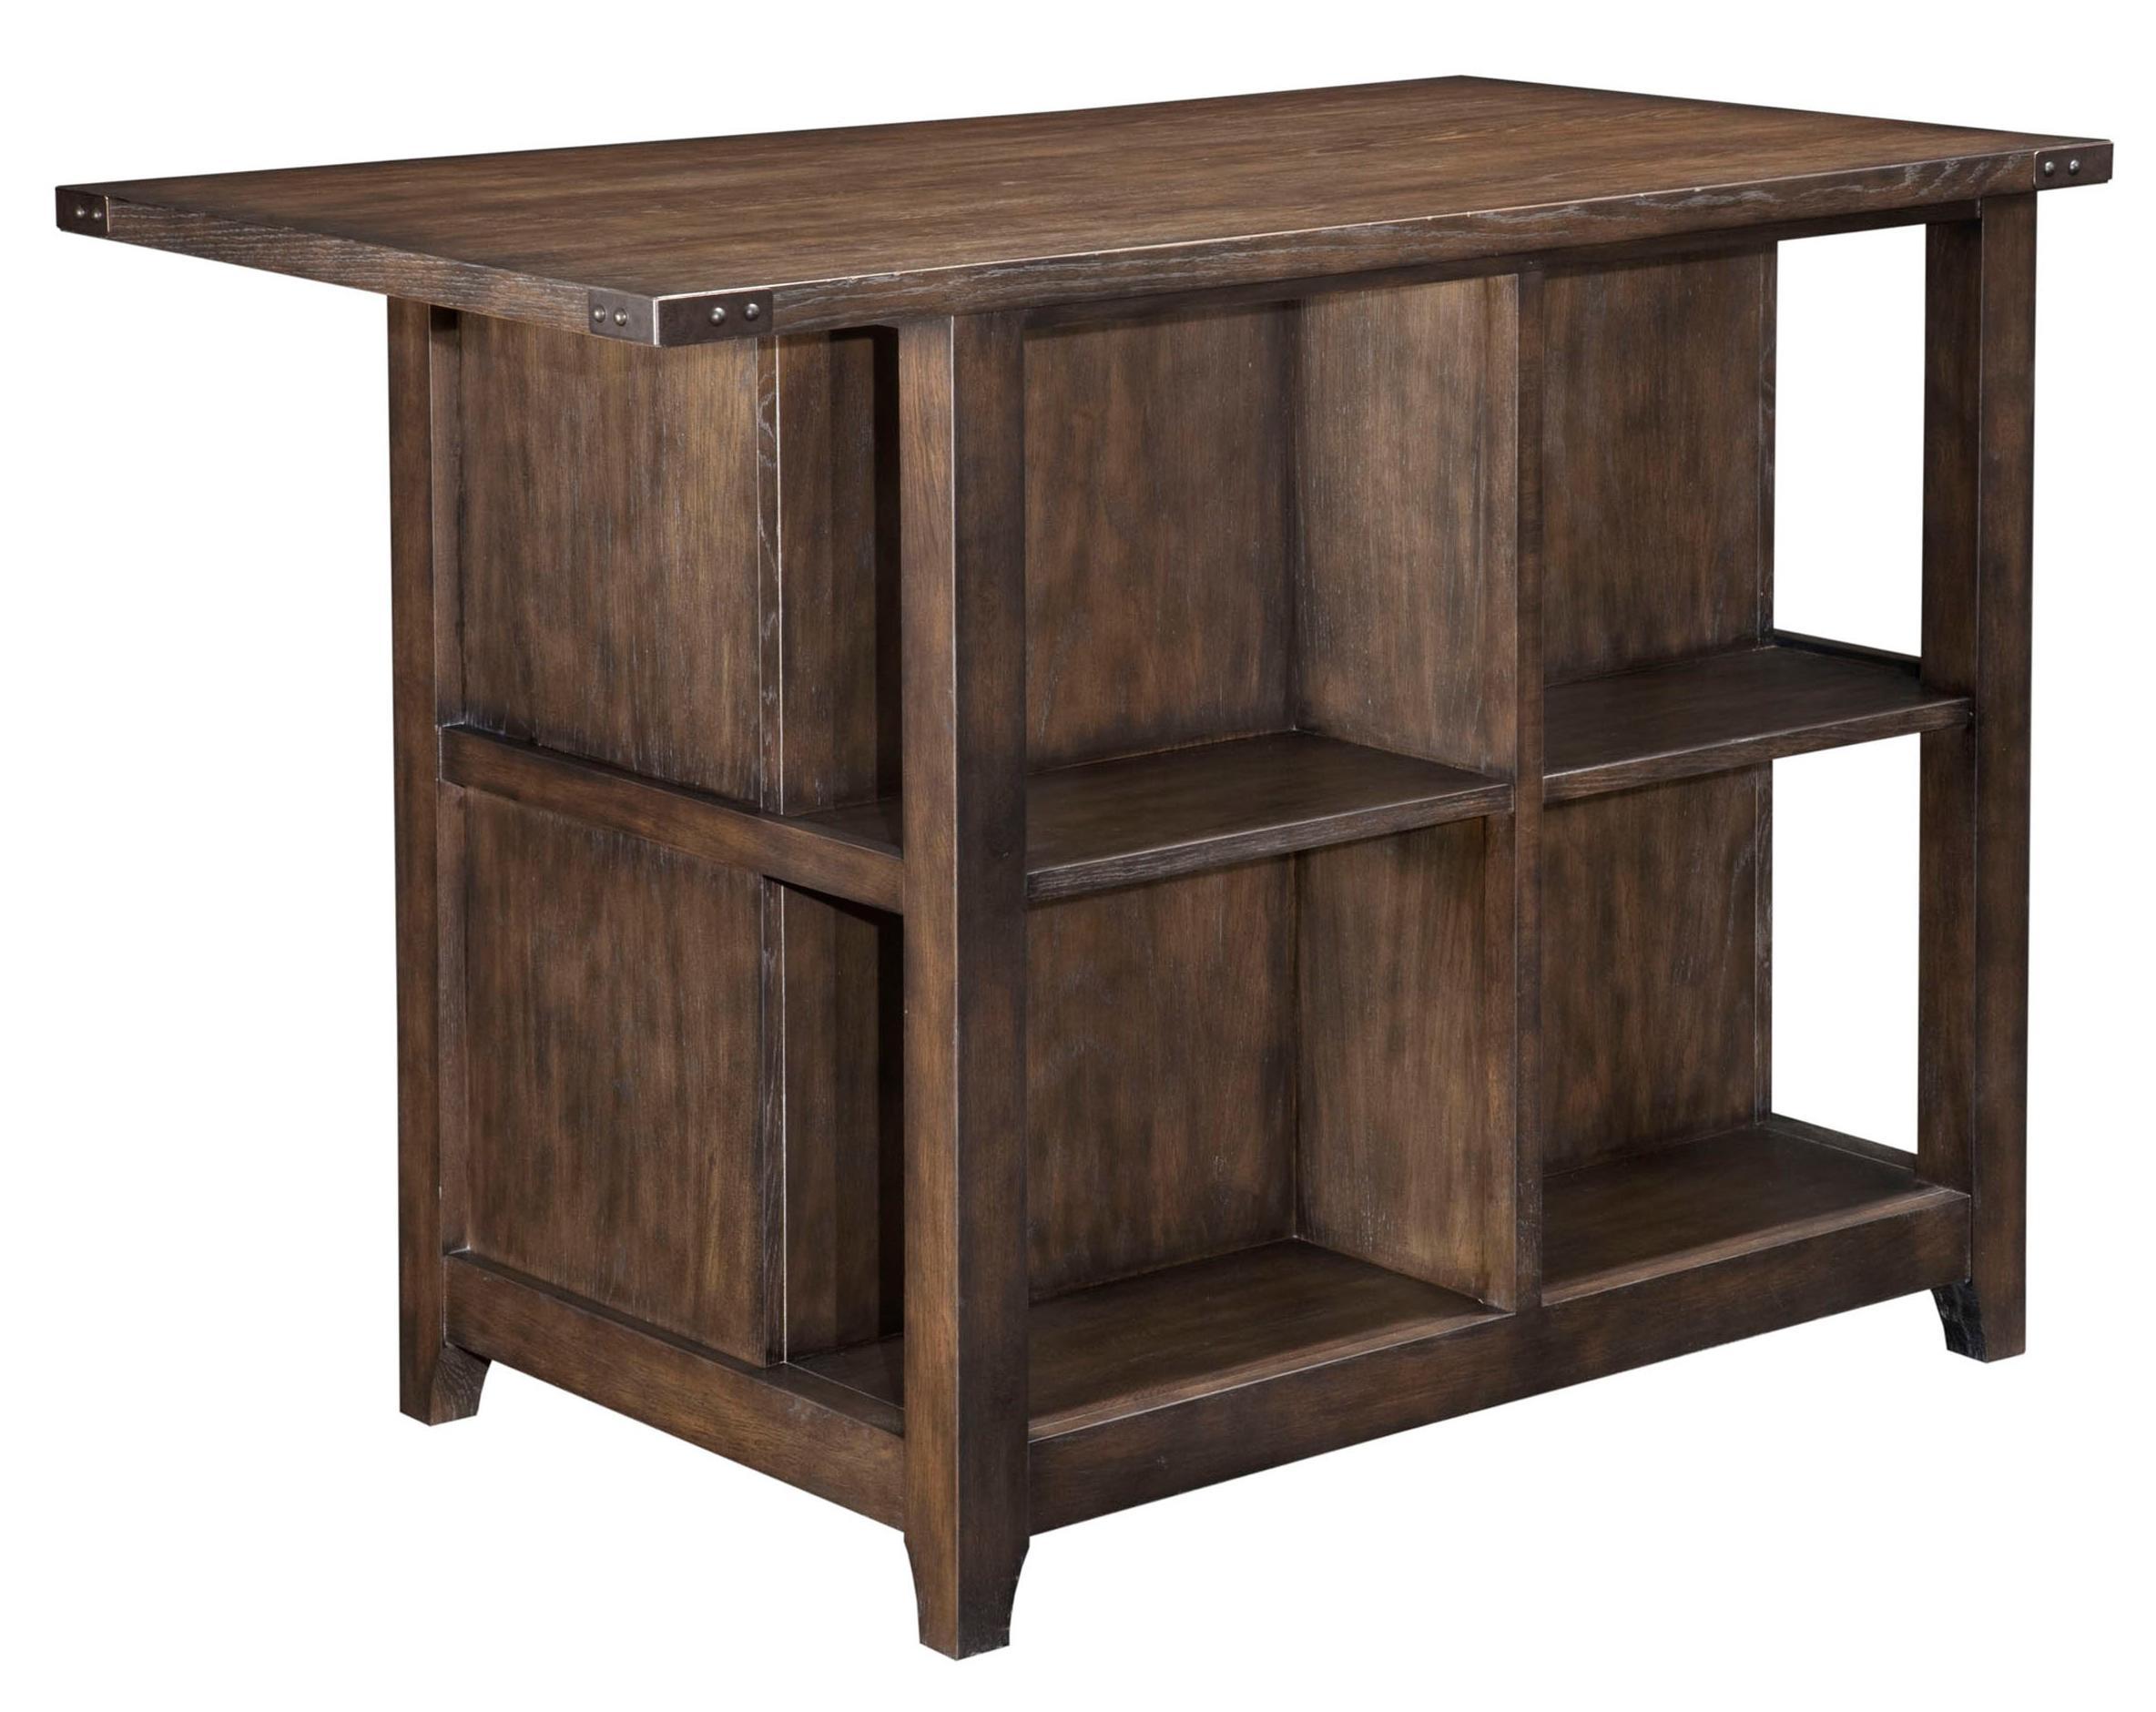 brise vue bois small attic design ideas. Black Bedroom Furniture Sets. Home Design Ideas